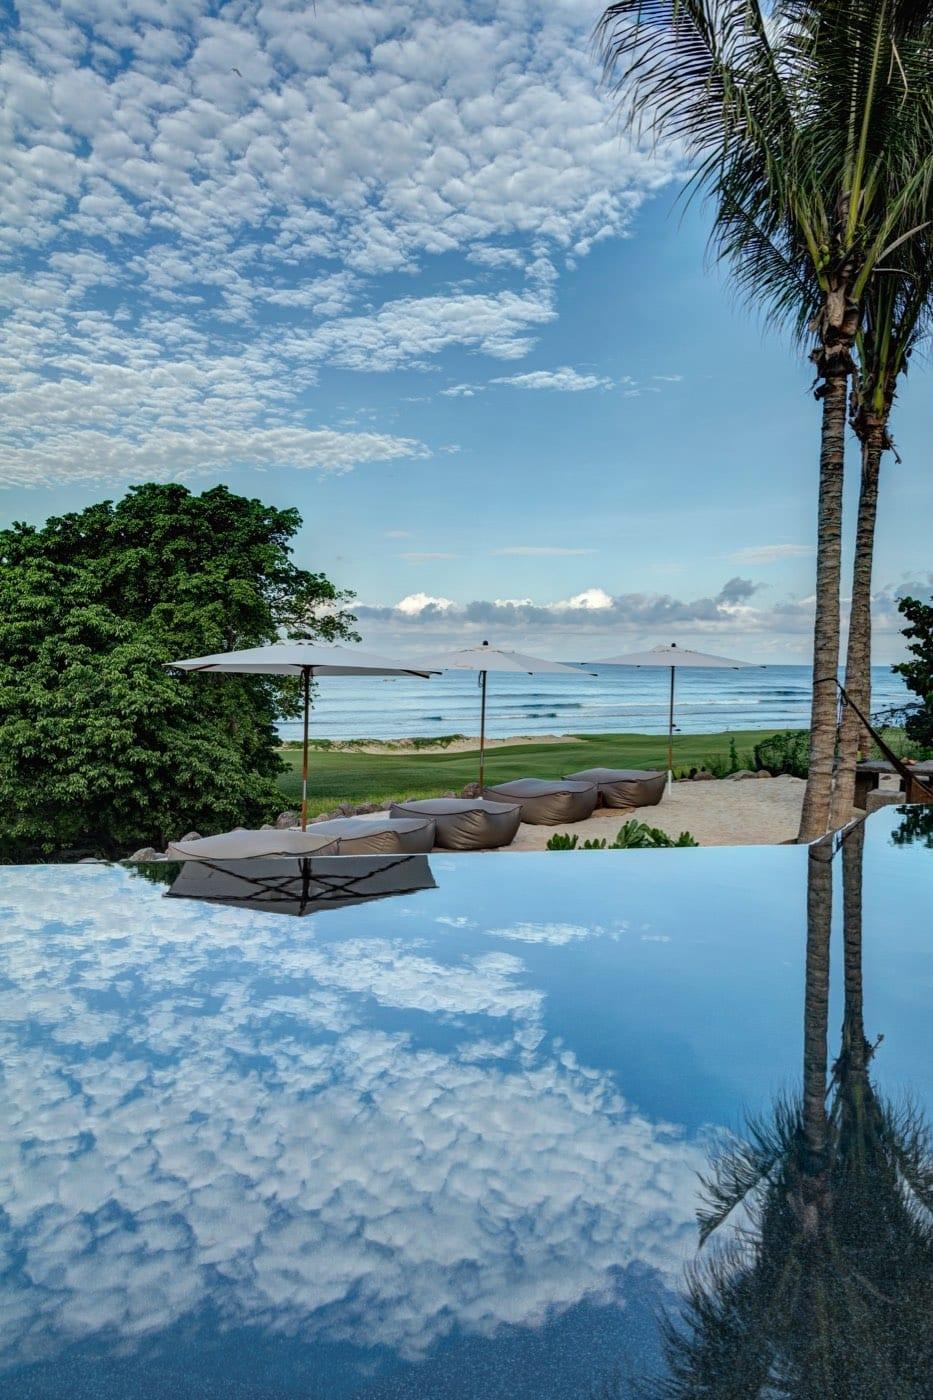 Casa Koko Reflection Over Pool Day